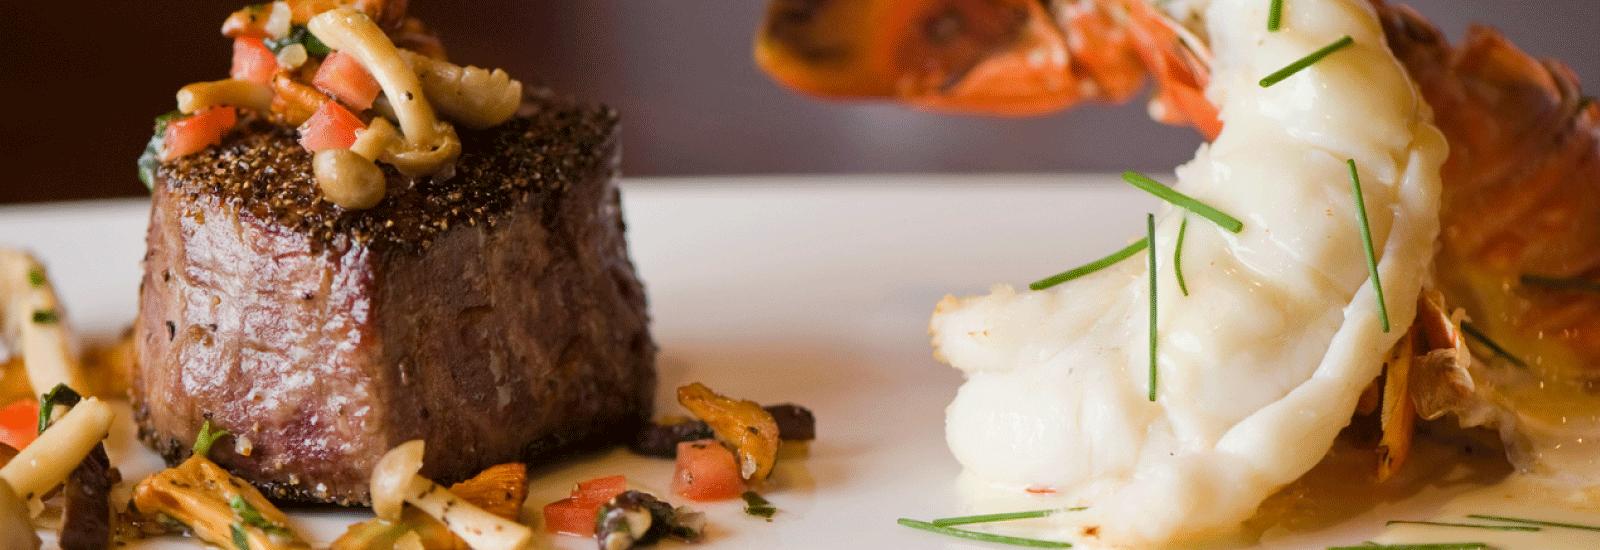 Steak and Seafood Near Malmstrom AFB